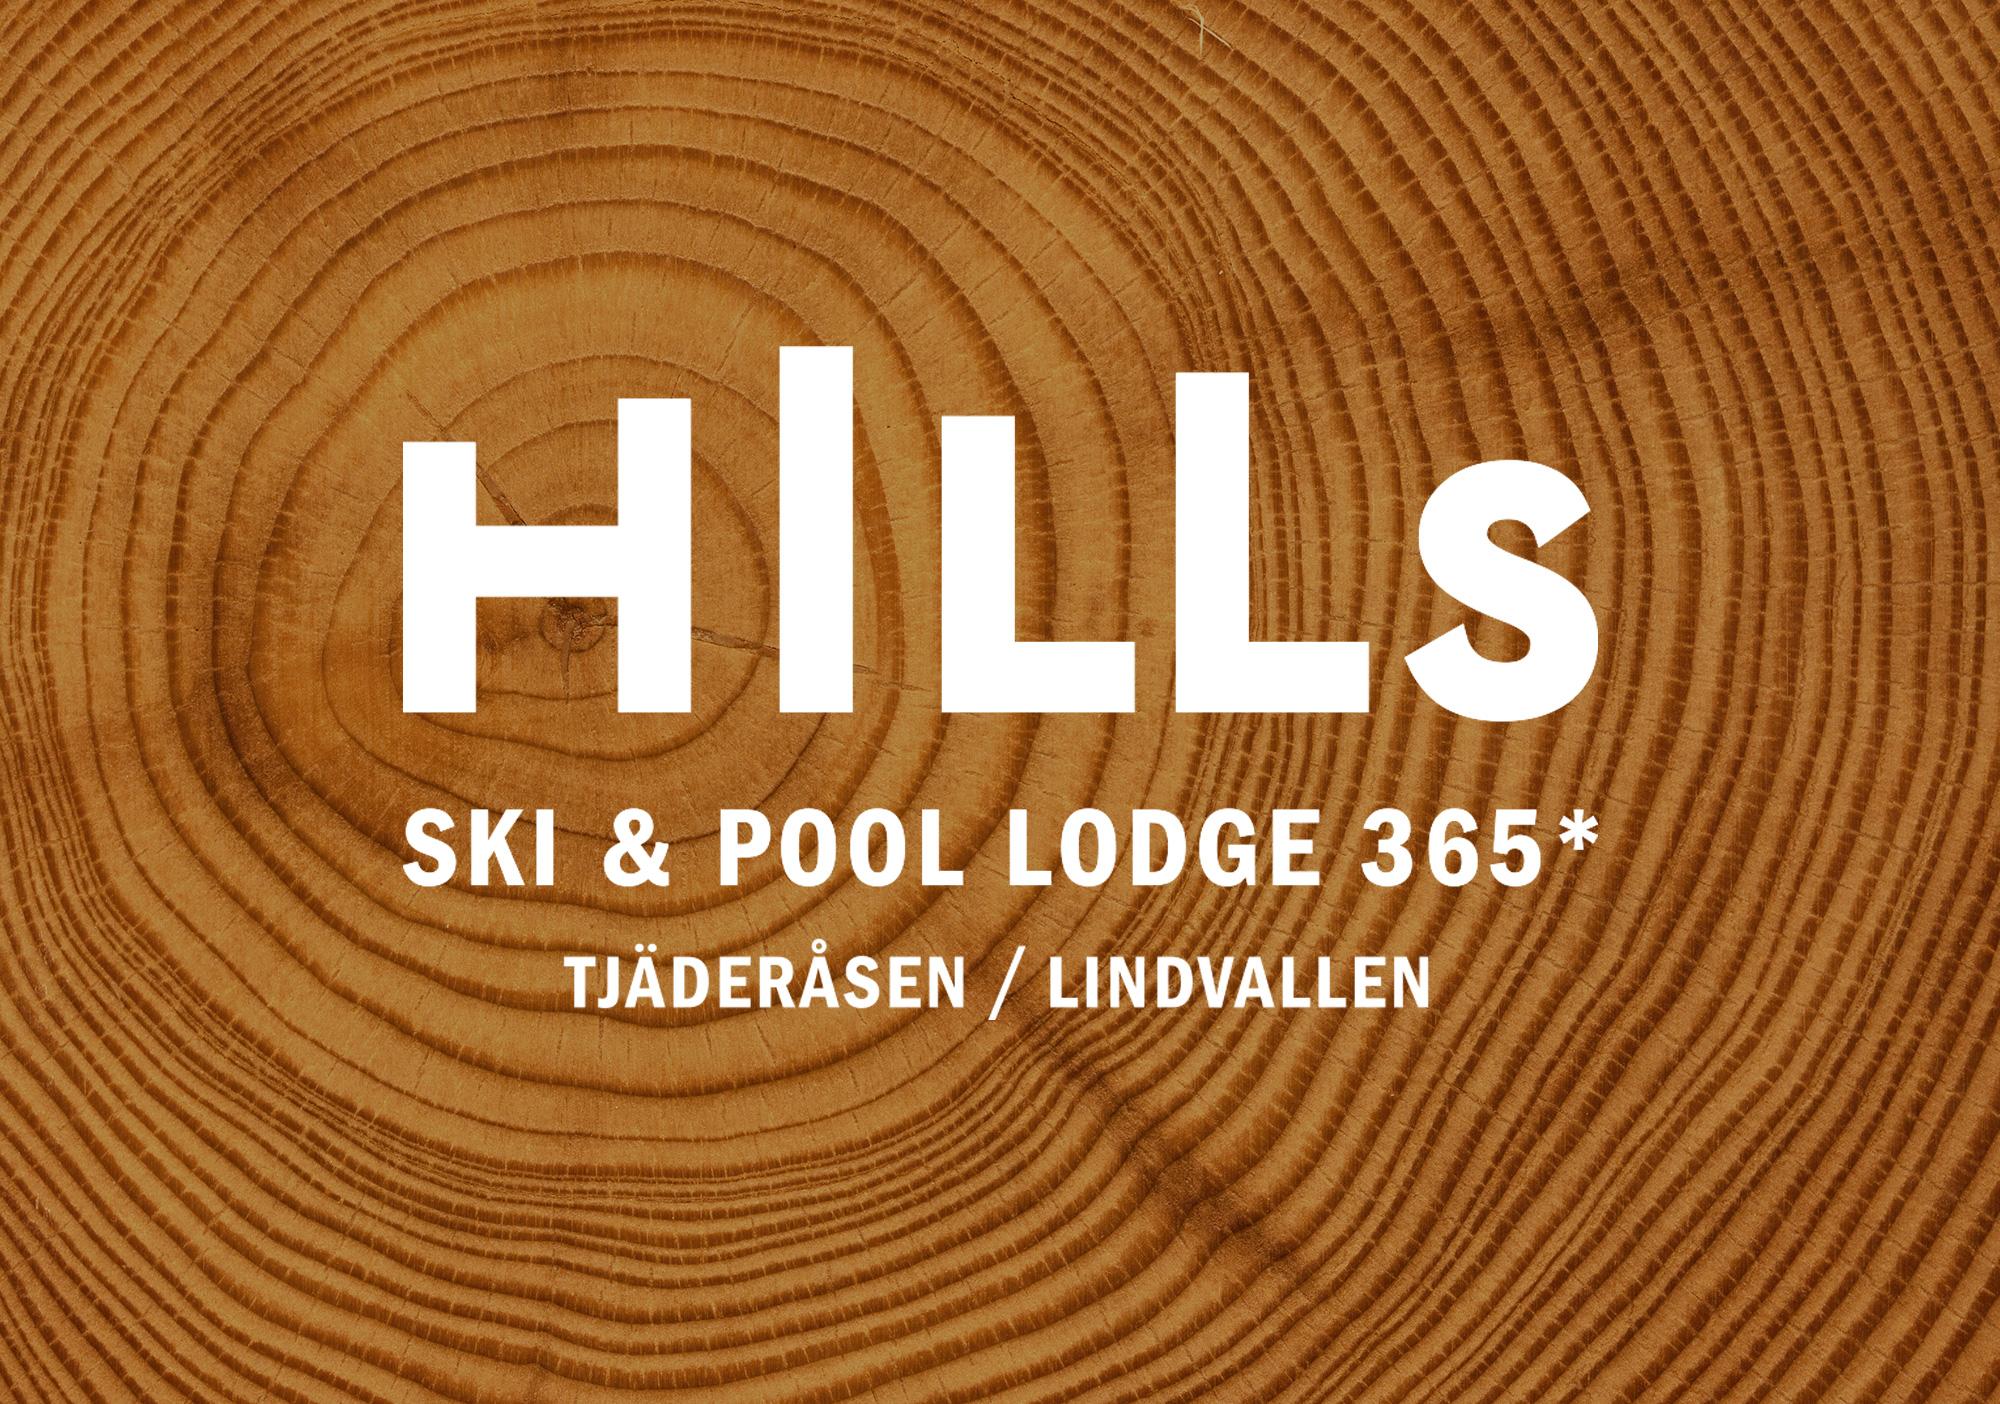 hills_logo3